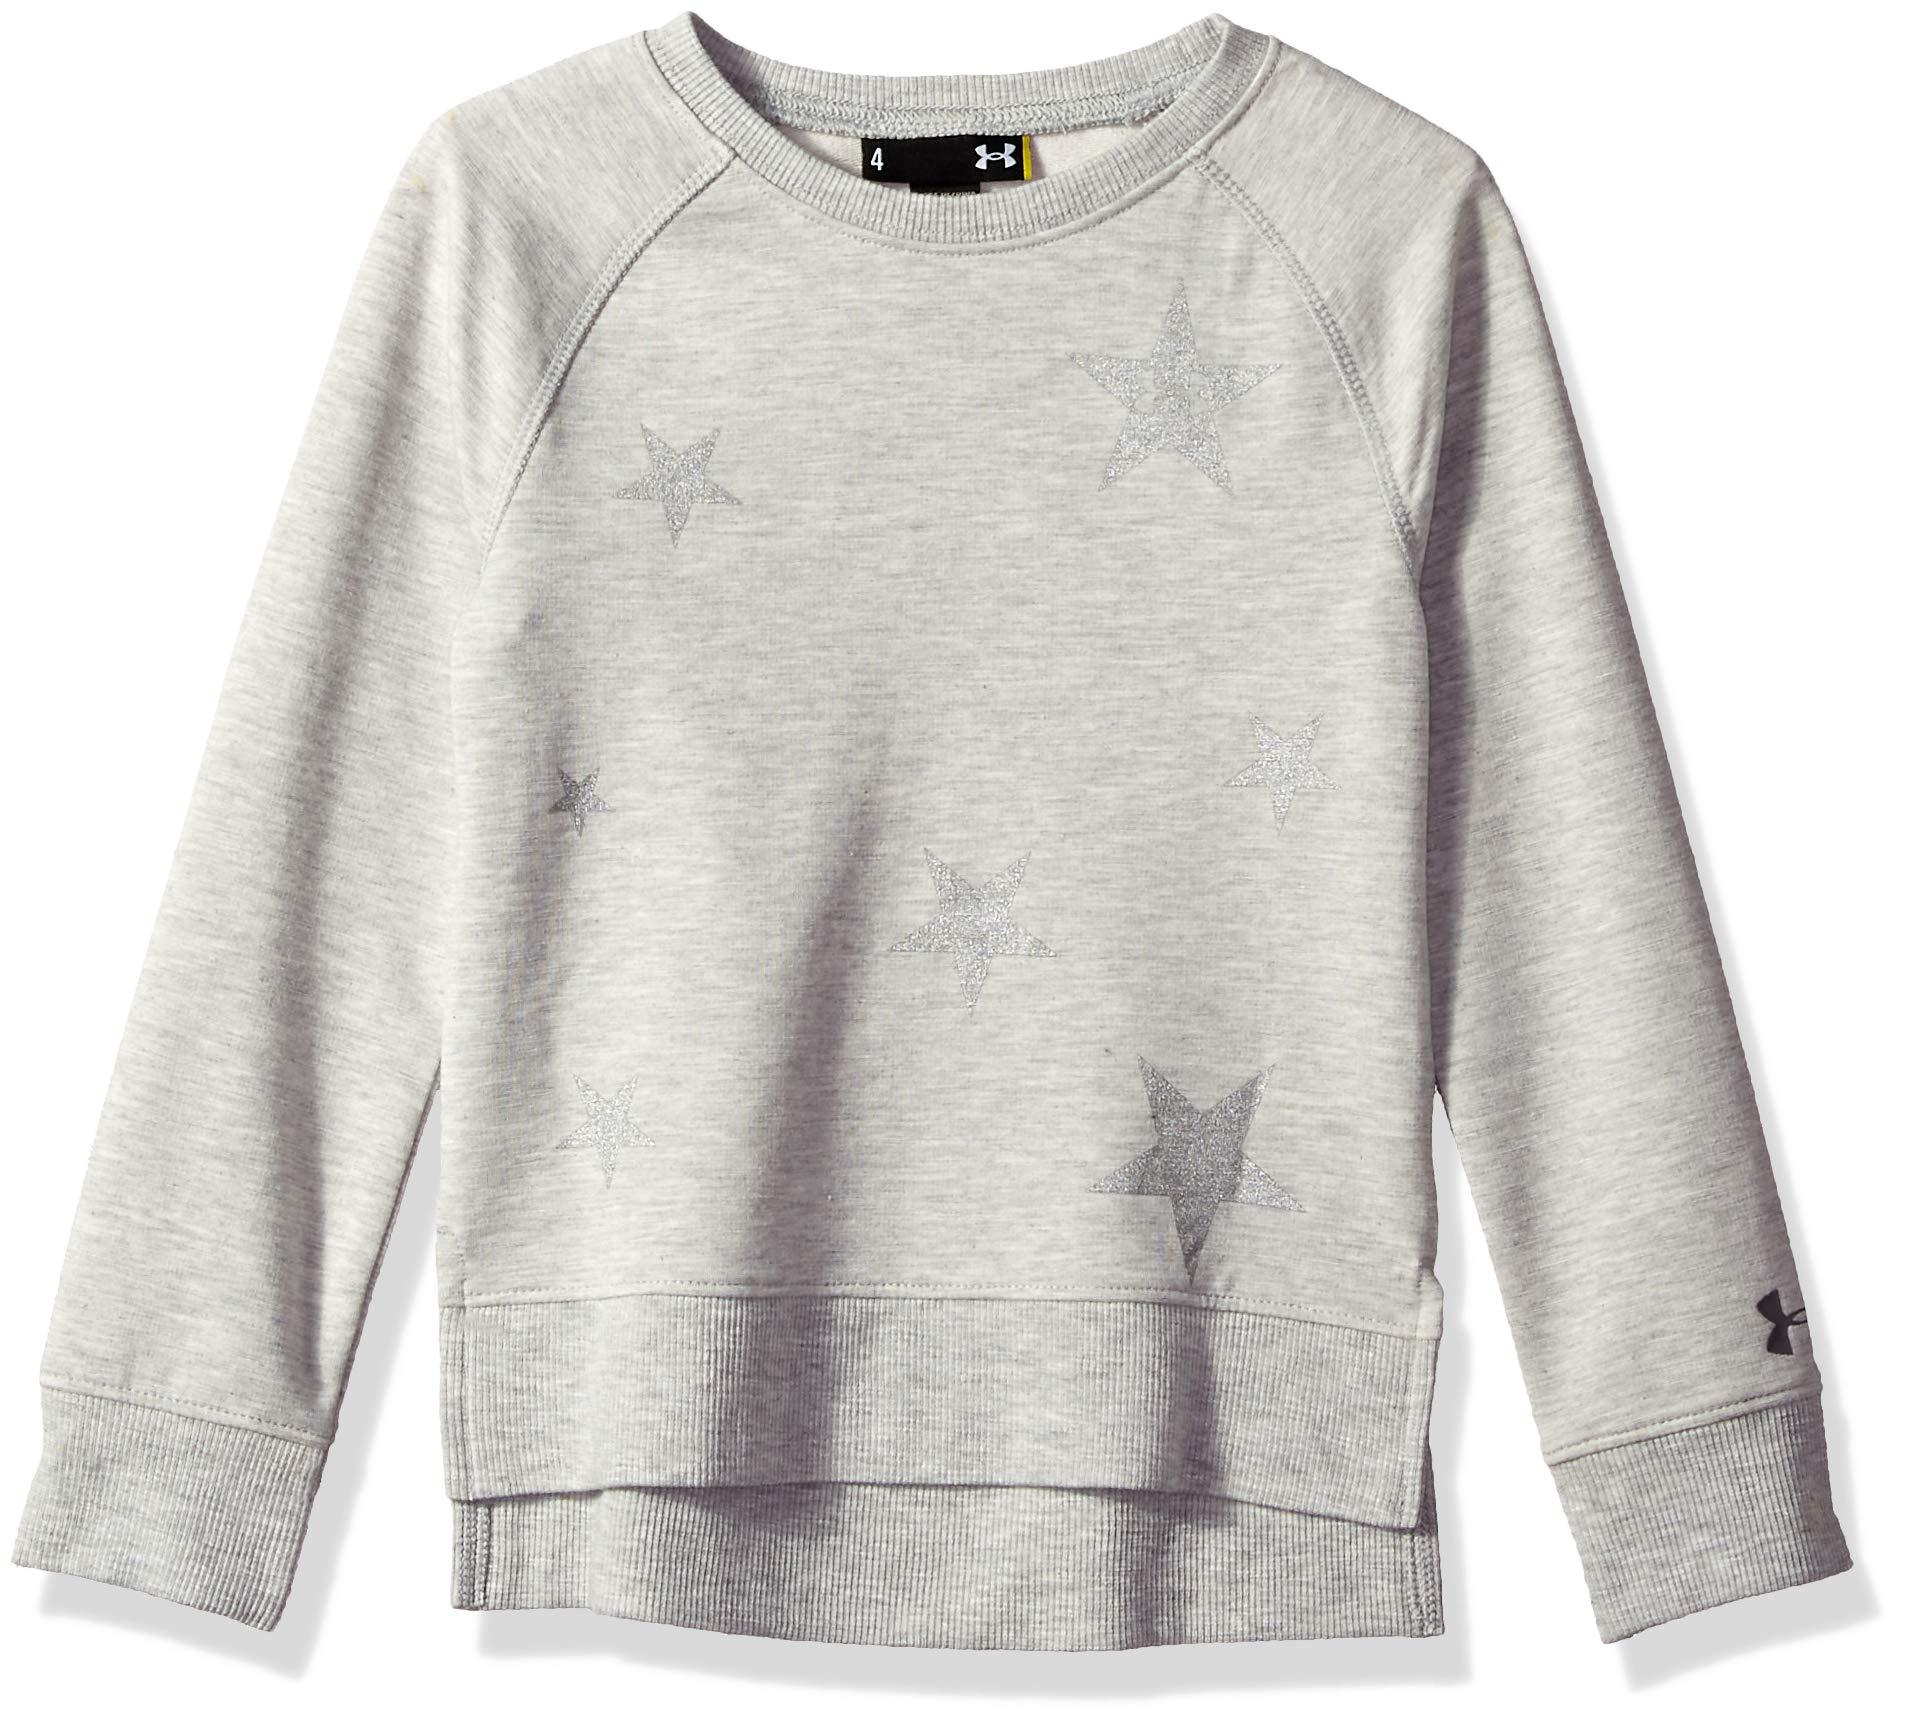 Under Armour Girls' Little Fashion Pullover Sweater, True Grey Heath, 6 by Under Armour